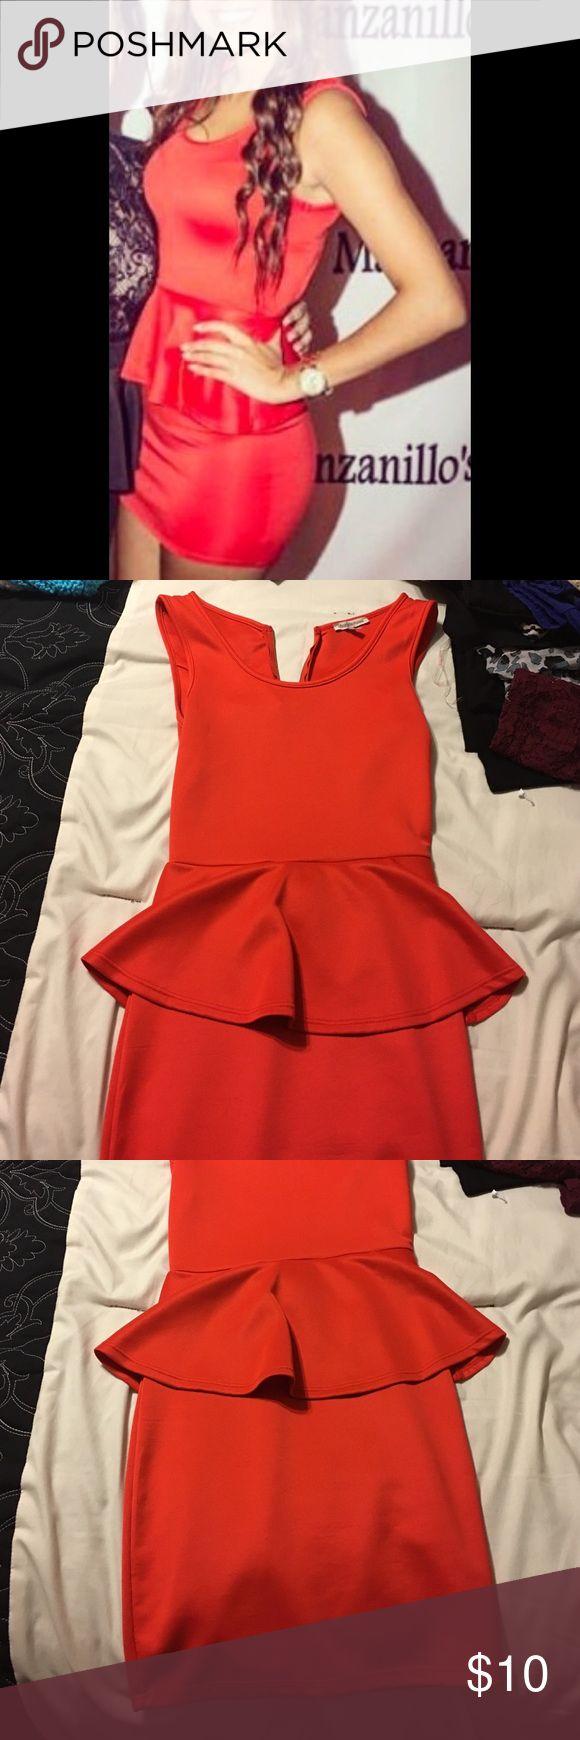 Orange Dress Orange tight shirt dress. Worn once. Size Small. From Charlotte Russe Charlotte Russe Dresses Mini